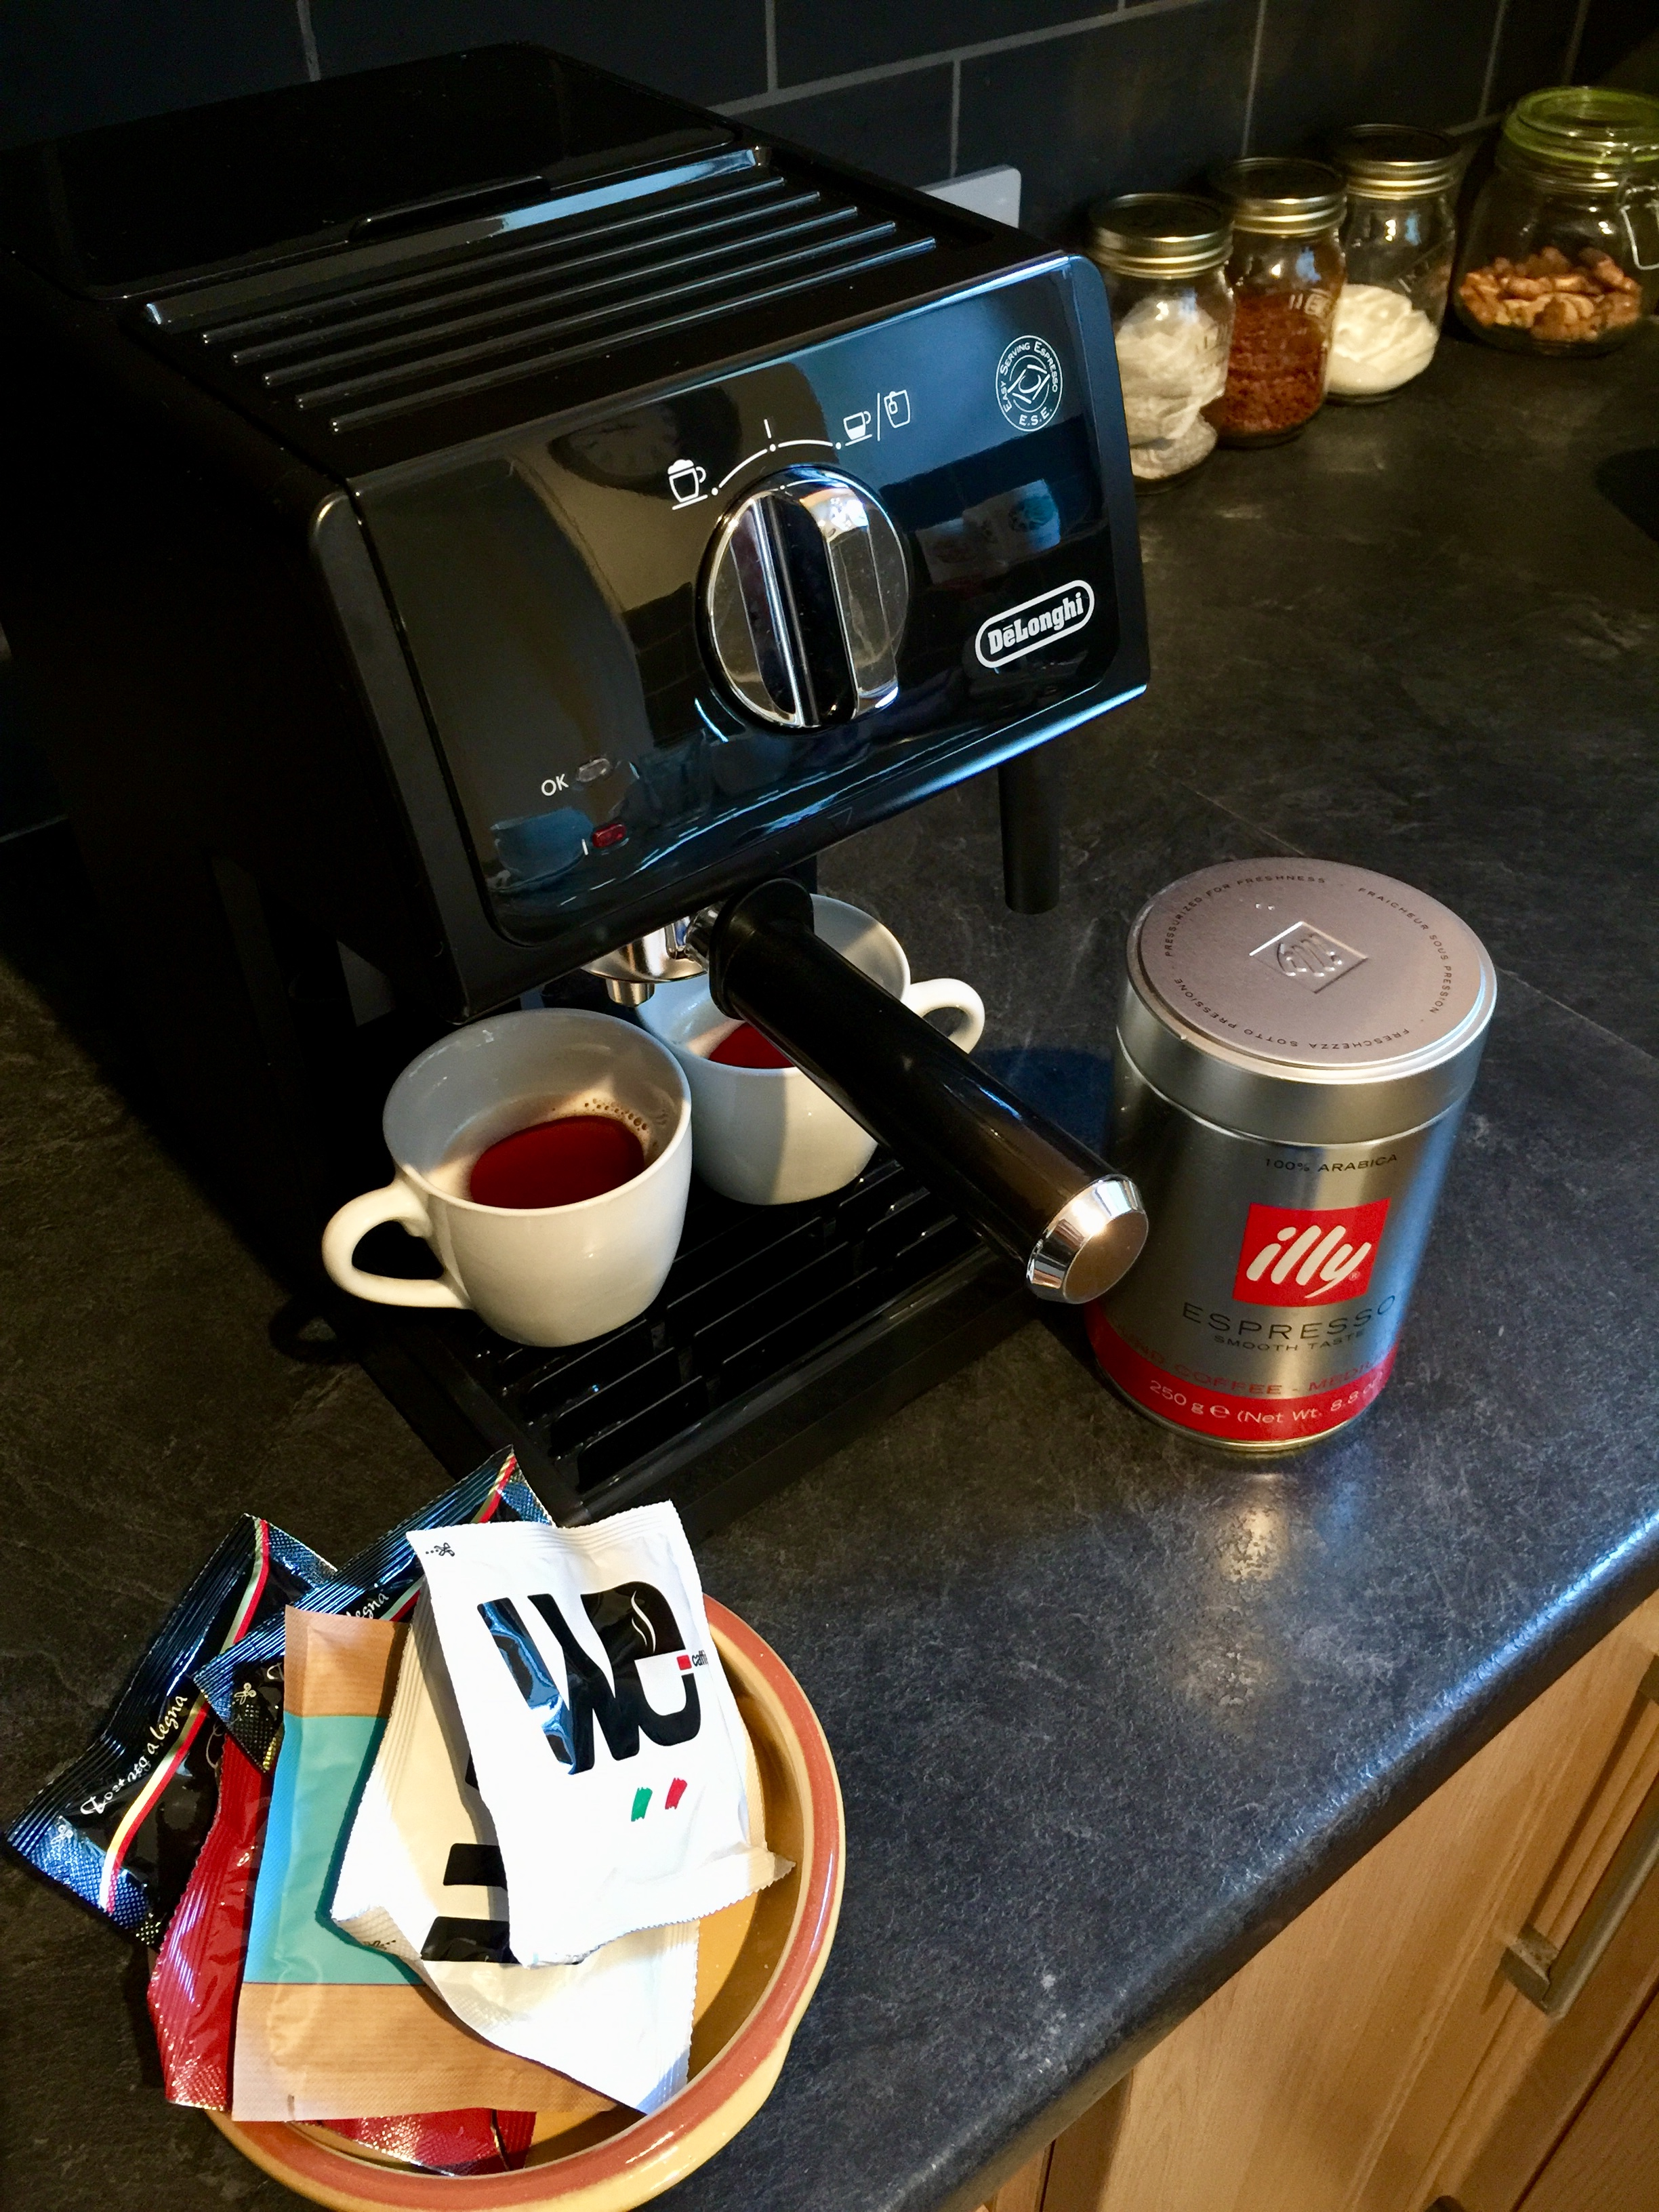 new pic of coffee machine